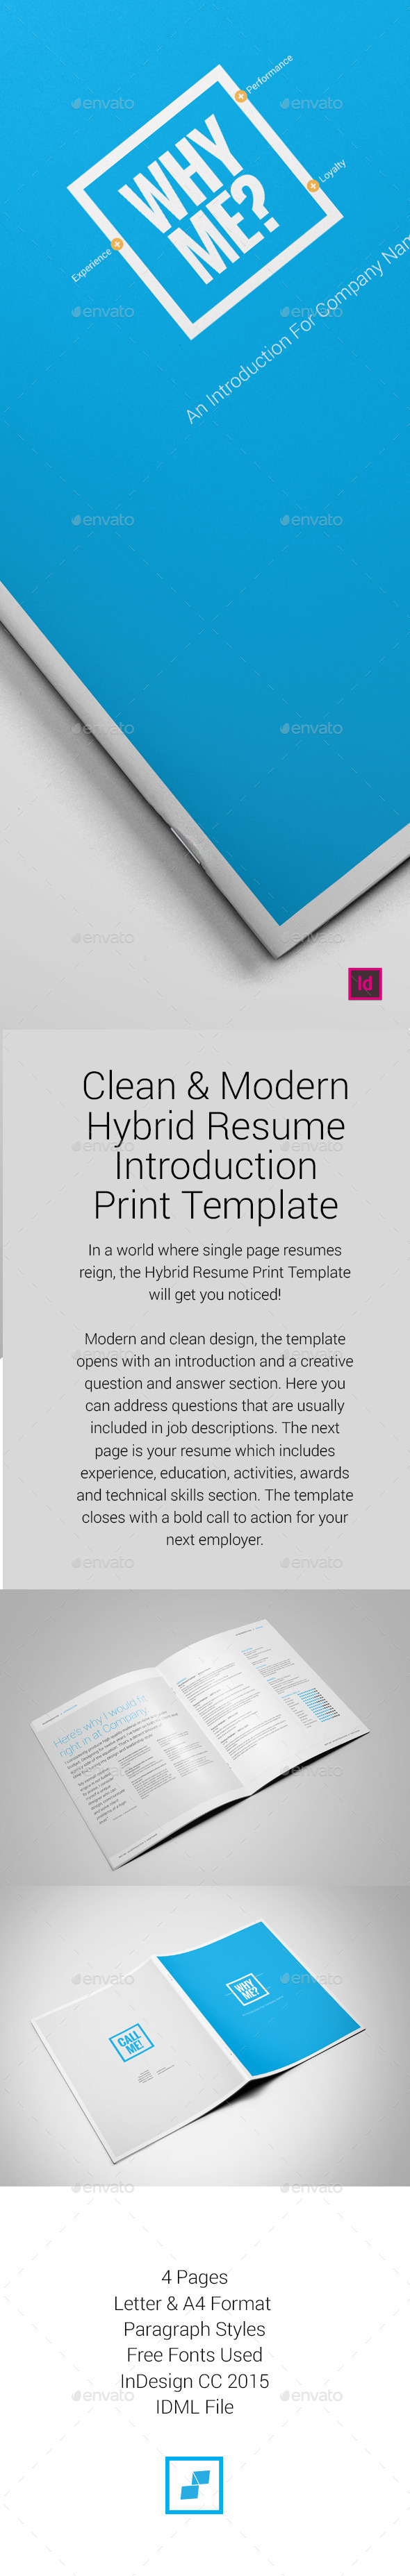 Hybrid Resume Print Template